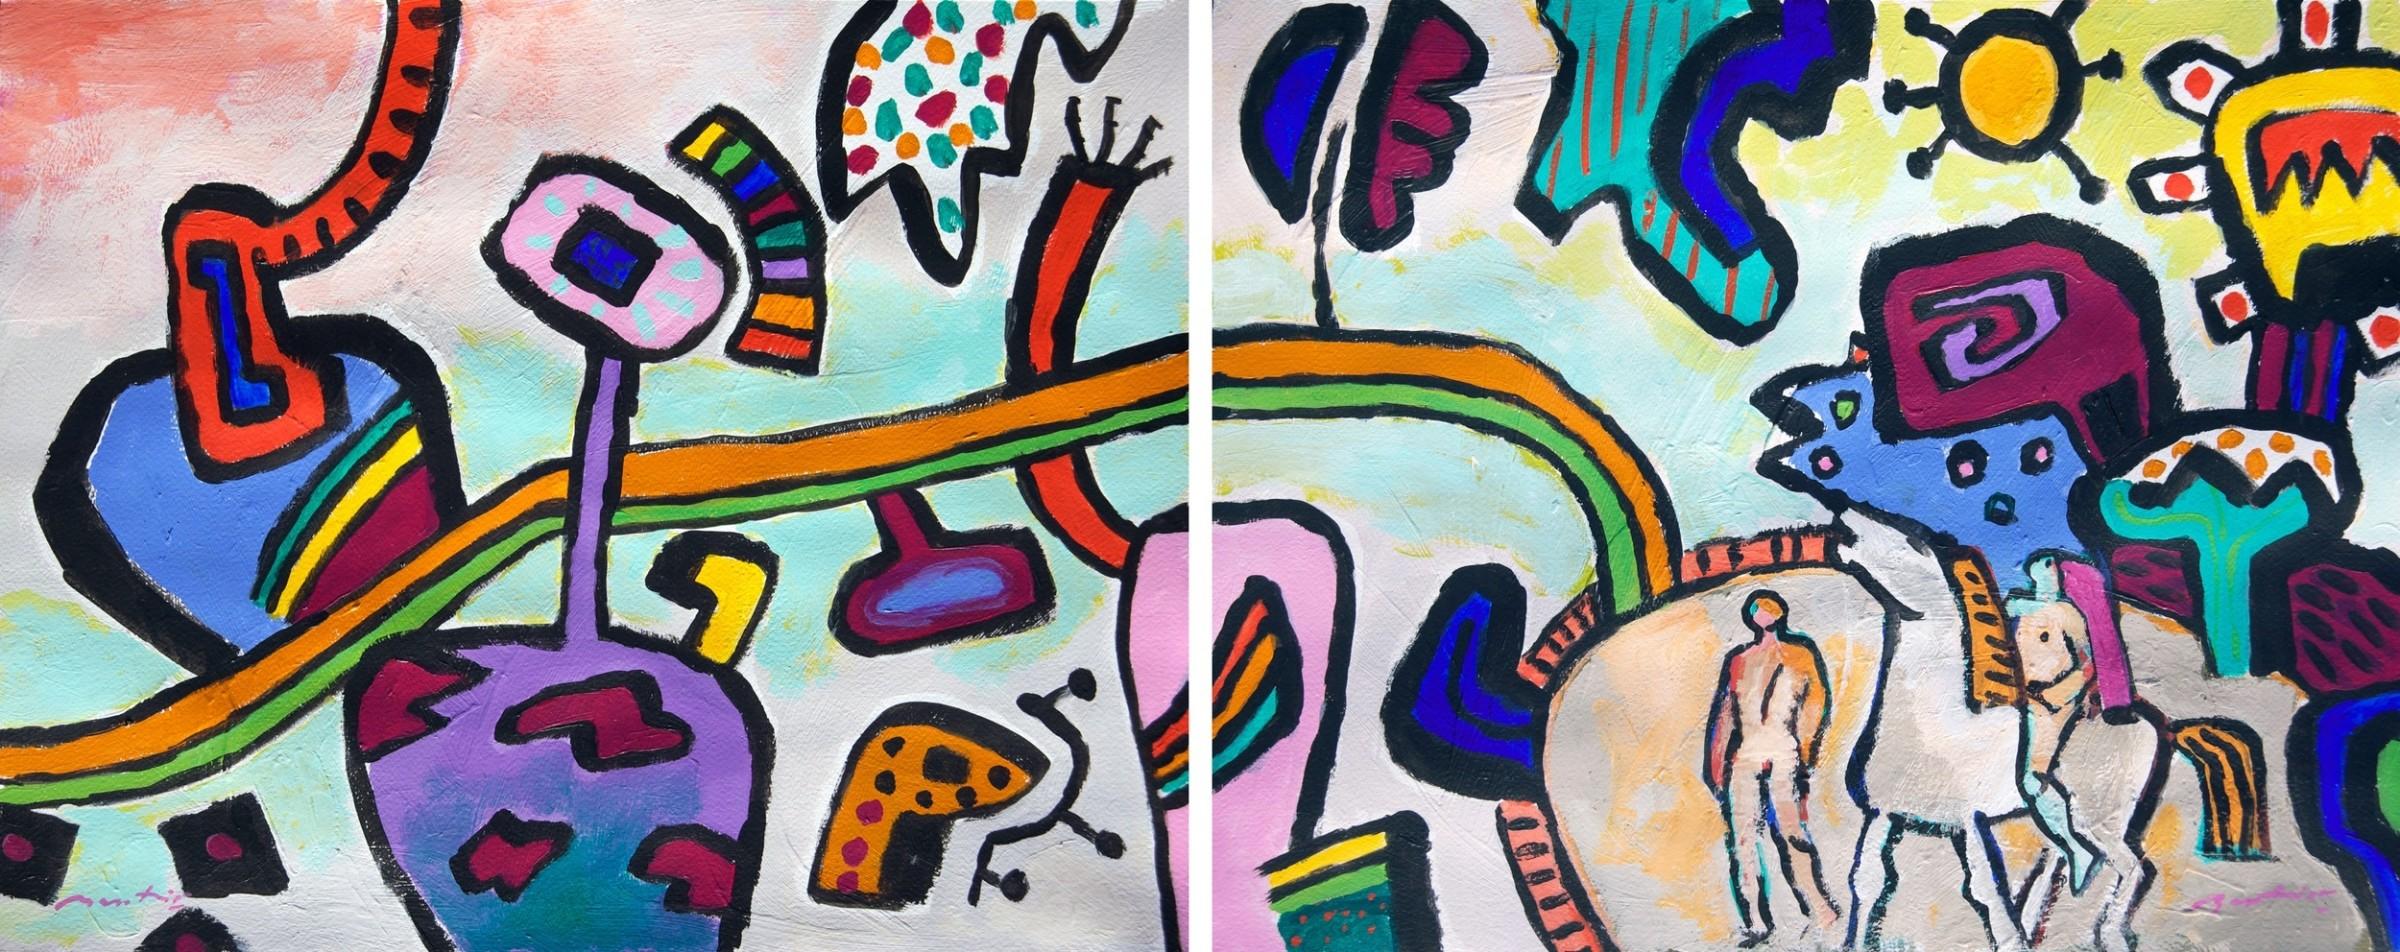 <span class=&#34;link fancybox-details-link&#34;><a href=&#34;/exhibitions/24/works/artworks_standalone10684/&#34;>View Detail Page</a></span><div class=&#34;artist&#34;><span class=&#34;artist&#34;><strong>Gerry Baptist</strong></span></div><div class=&#34;title&#34;><em>No Matter How Long It Takes</em></div><div class=&#34;medium&#34;>acrylic</div><div class=&#34;dimensions&#34;>Diptych 44 x 108cm</div>